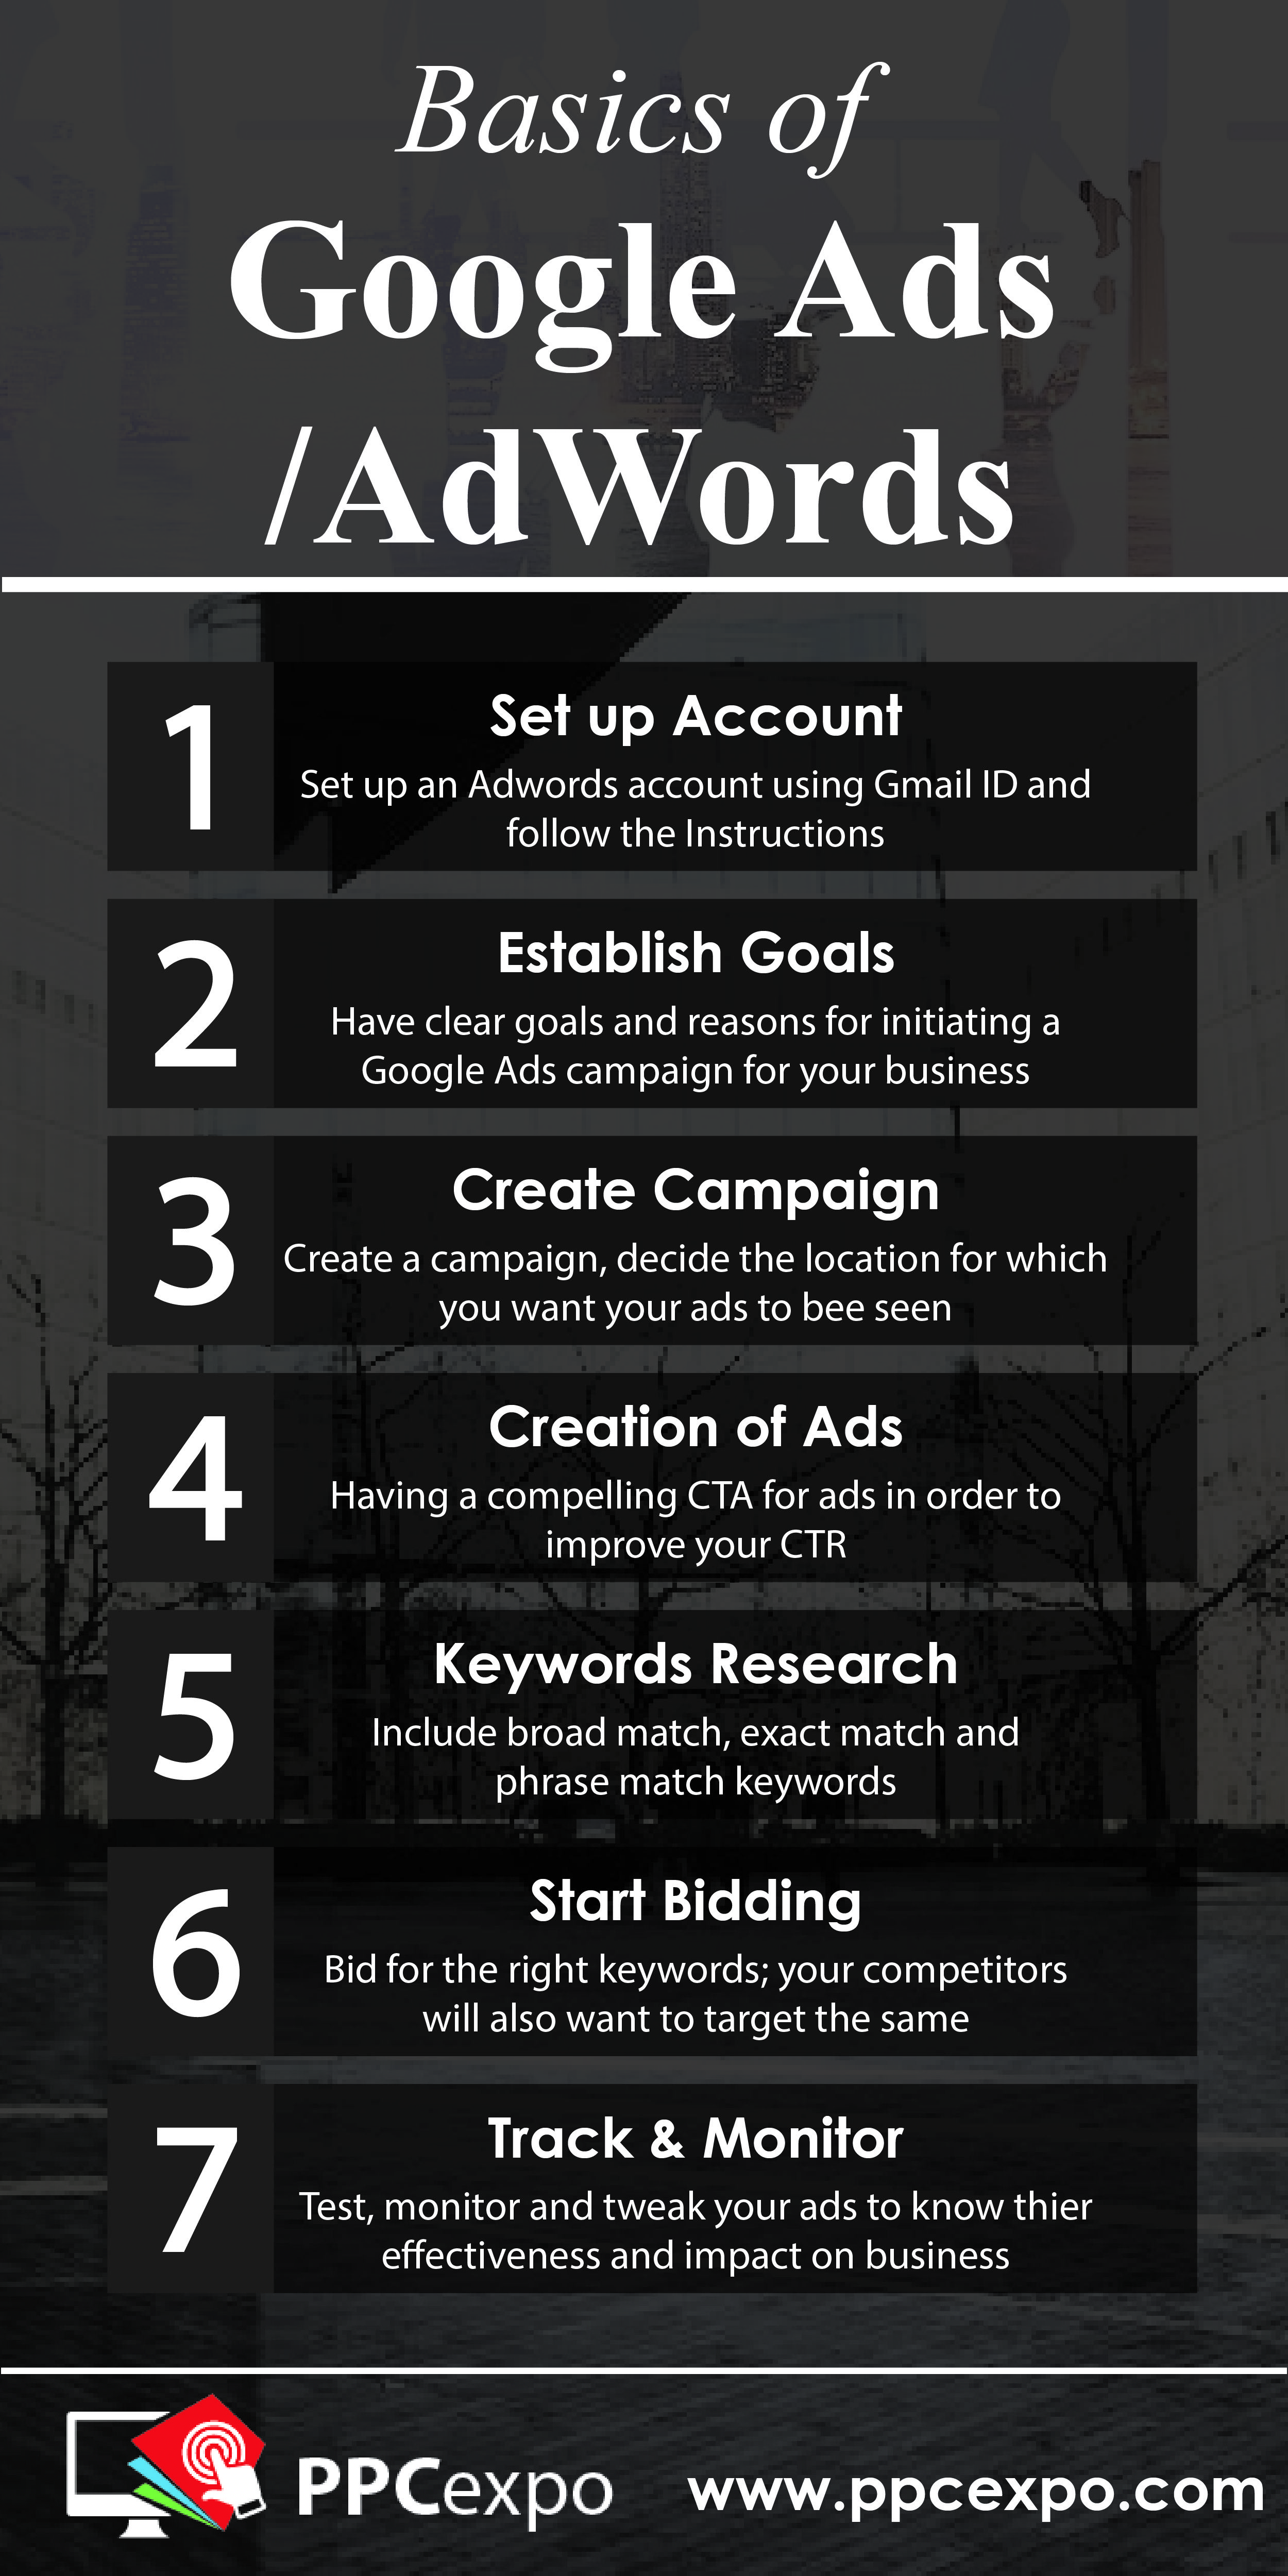 Advertising-Infographics-Google-AdWords-Basics-in-7-Steps Advertising Infographics : Google AdWords Basics in 7 Steps!